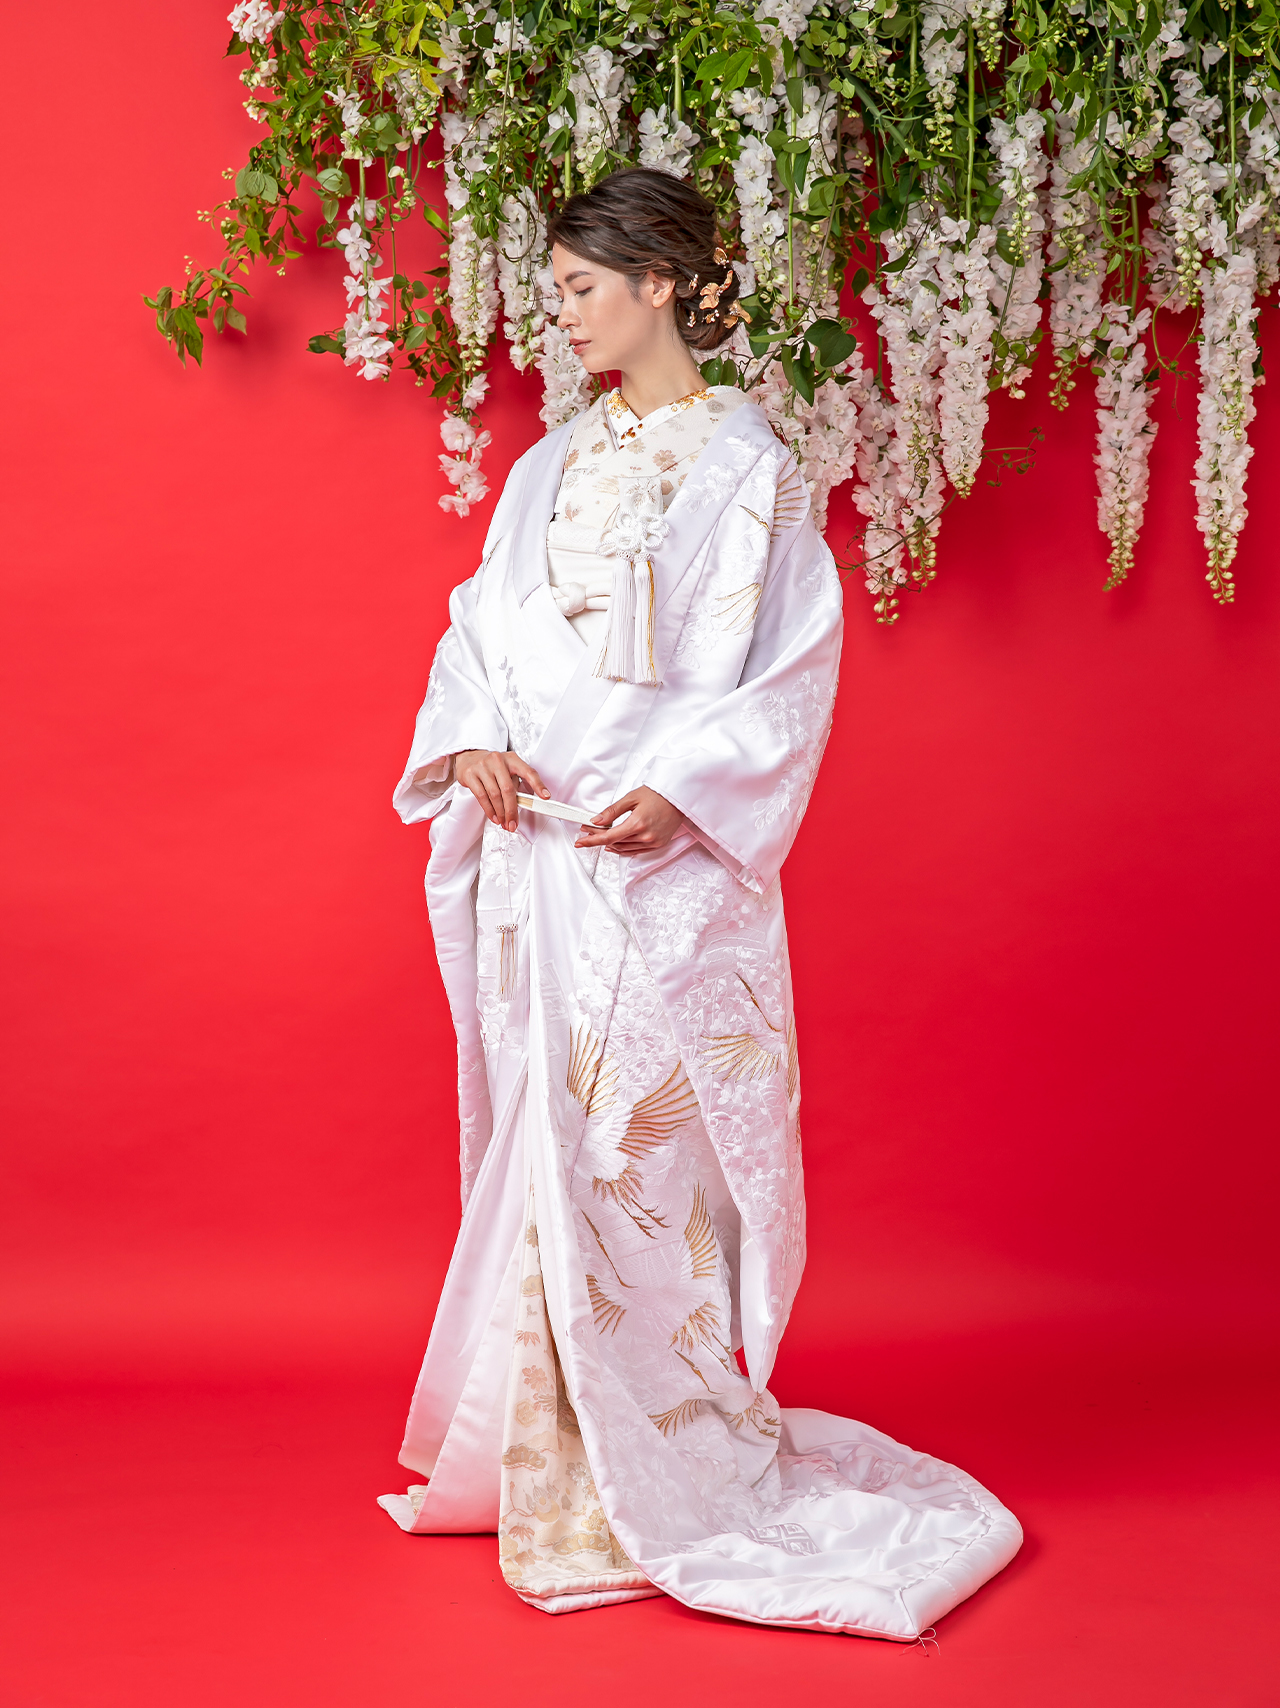 Fiore Bianca 白無垢 フィオーレビアンカ